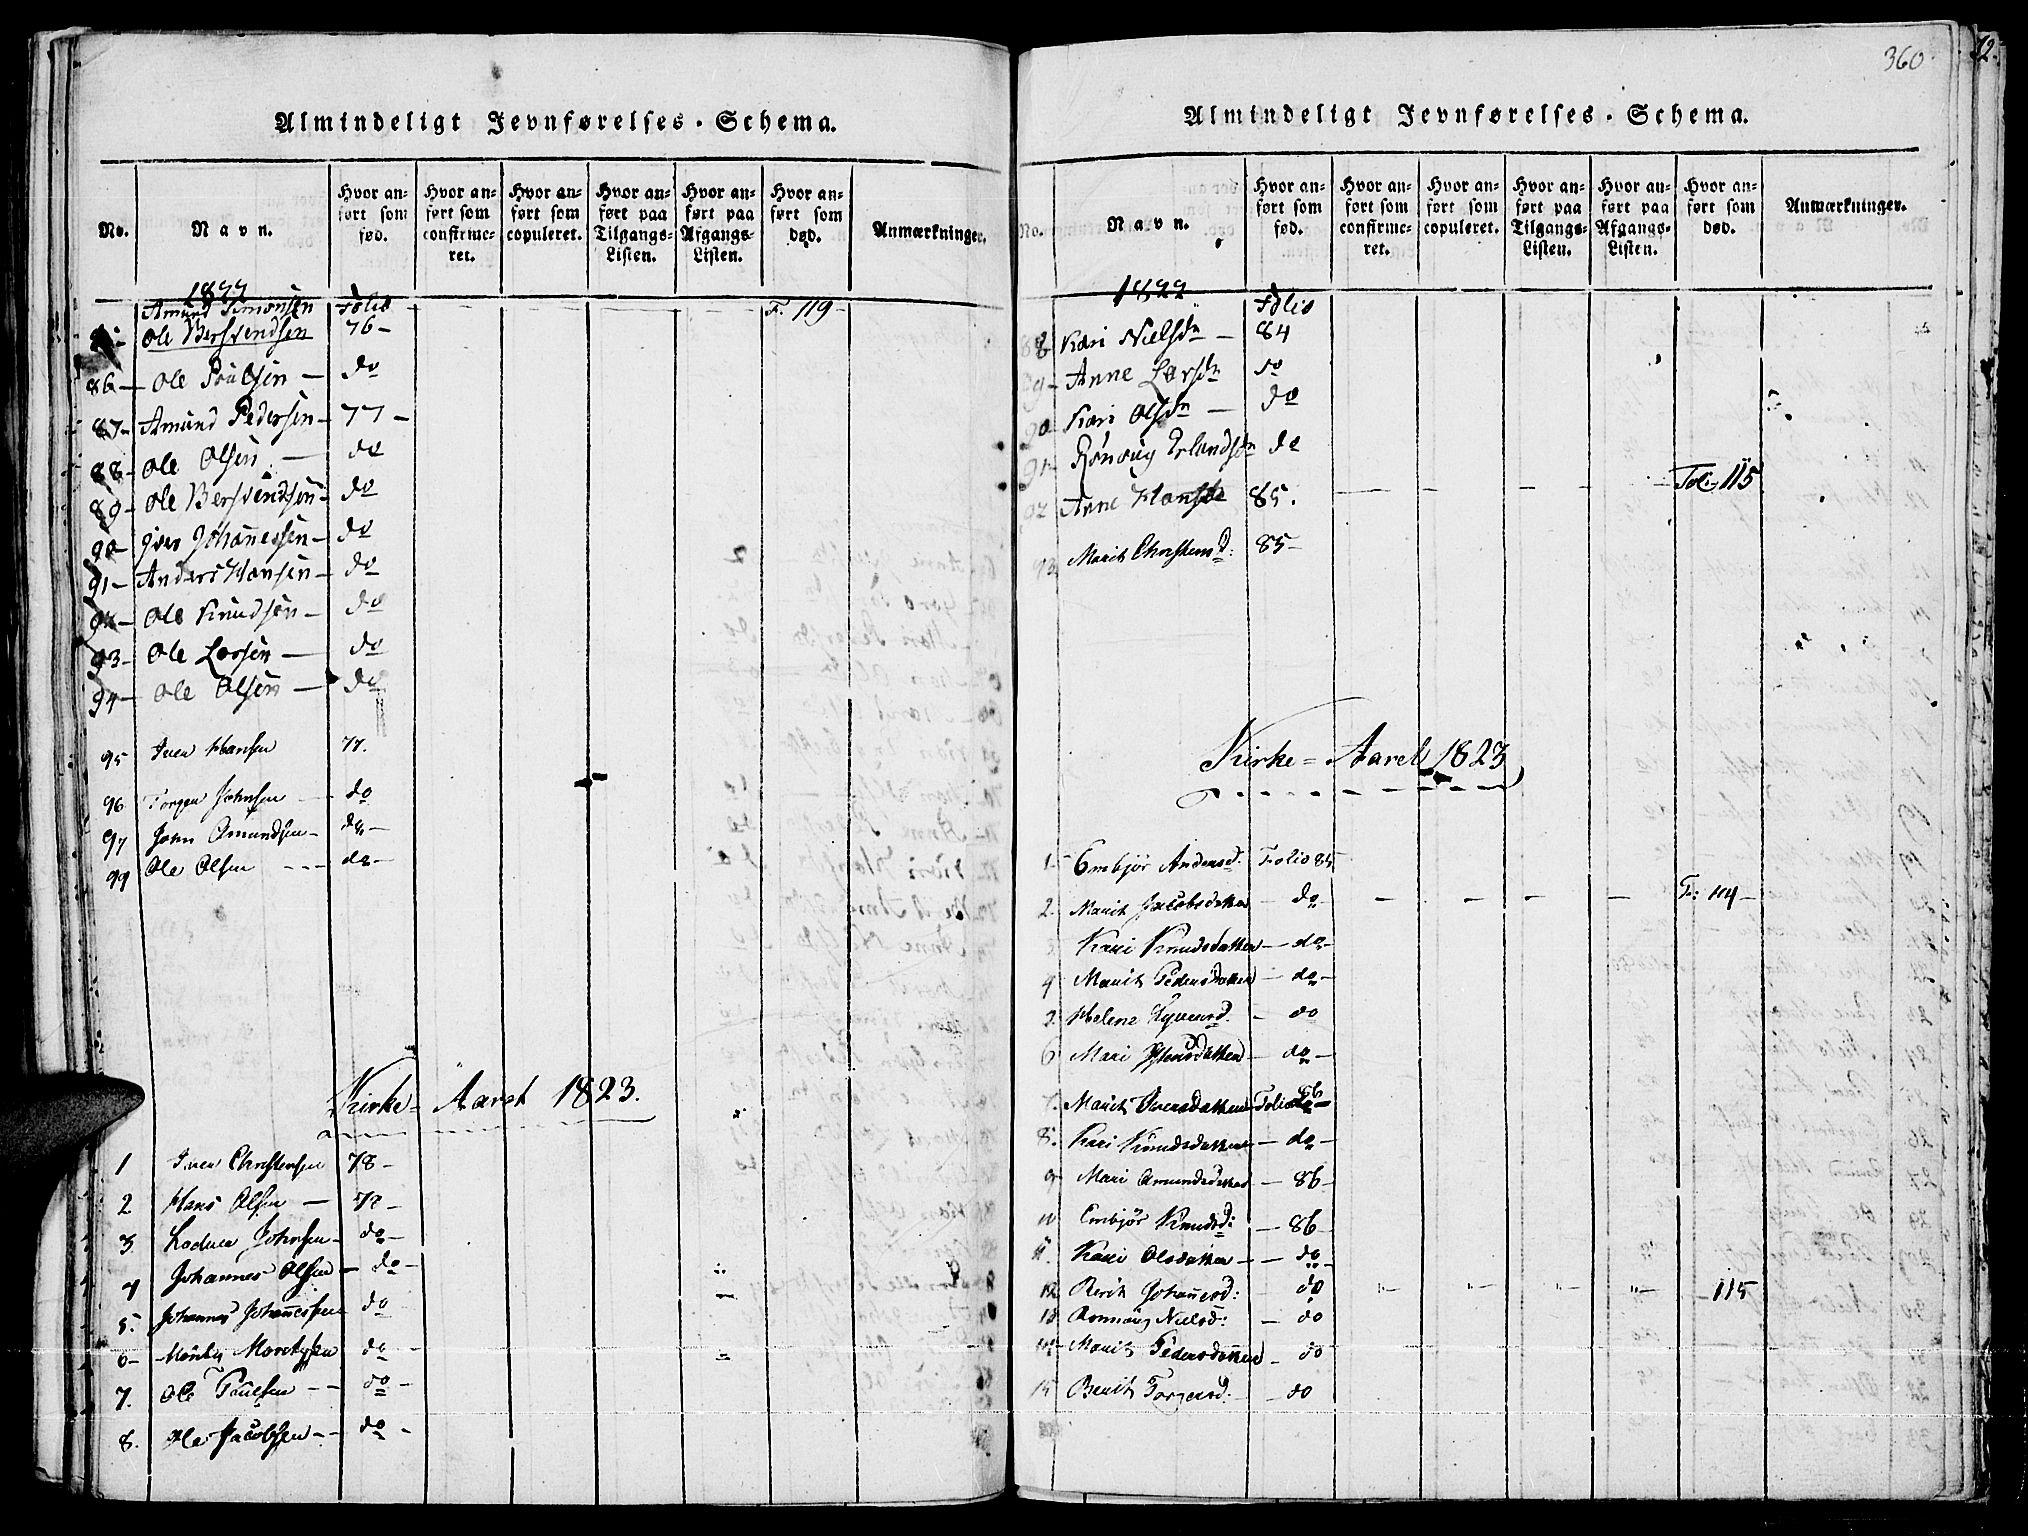 SAH, Fron prestekontor, H/Ha/Haa/L0002: Ministerialbok nr. 2, 1816-1827, s. 360